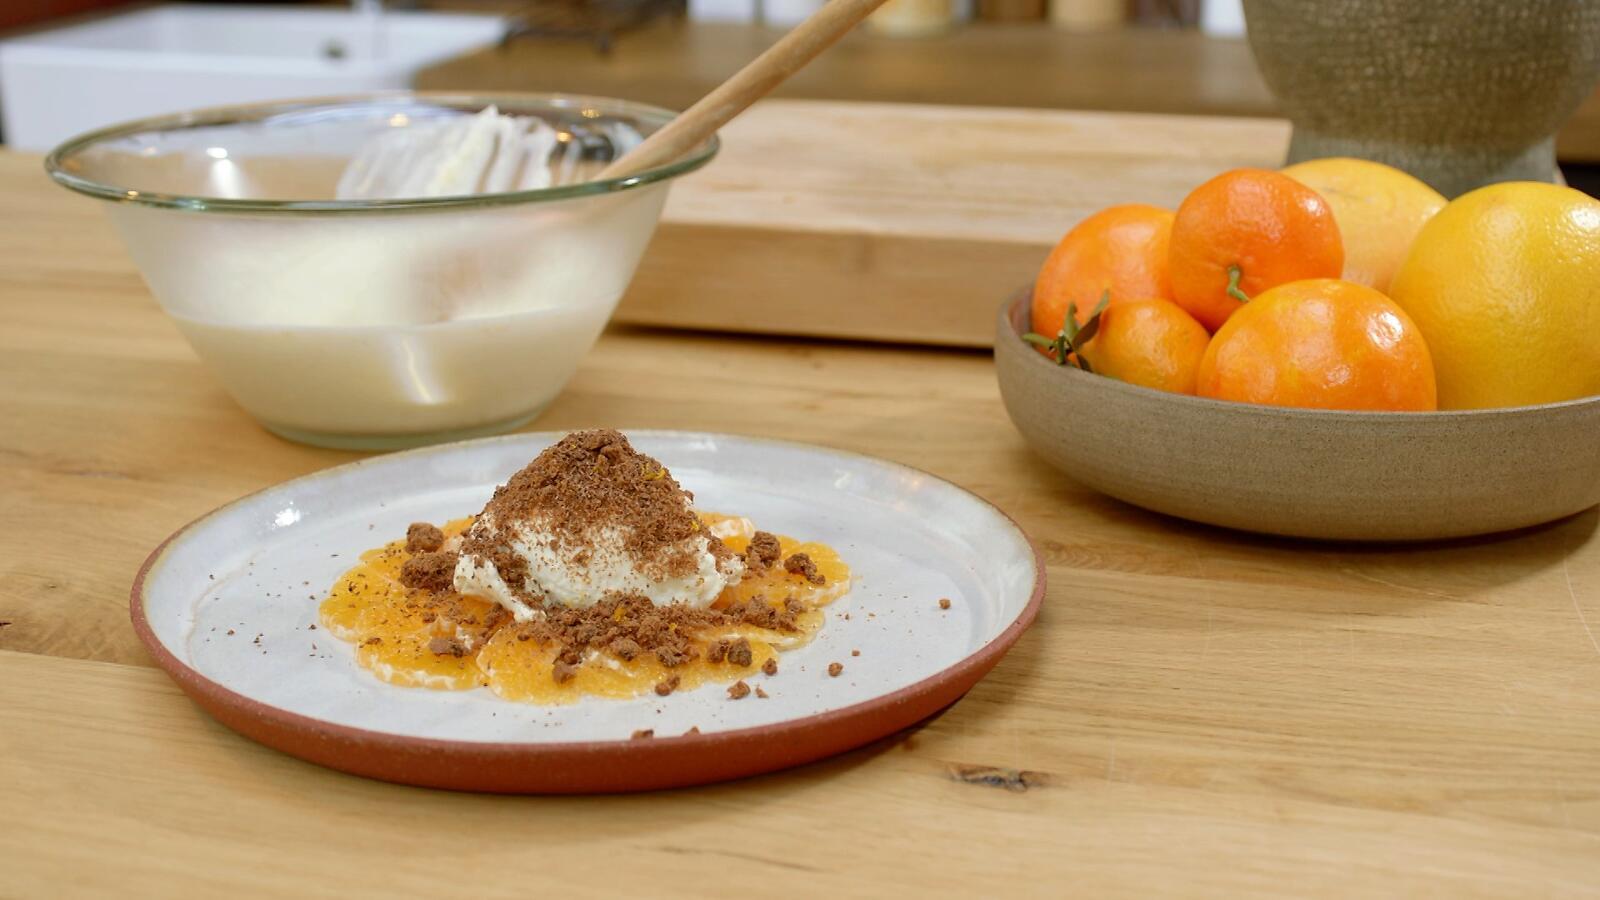 Mousse van platte kaas met clementines en chocoladekoekjes